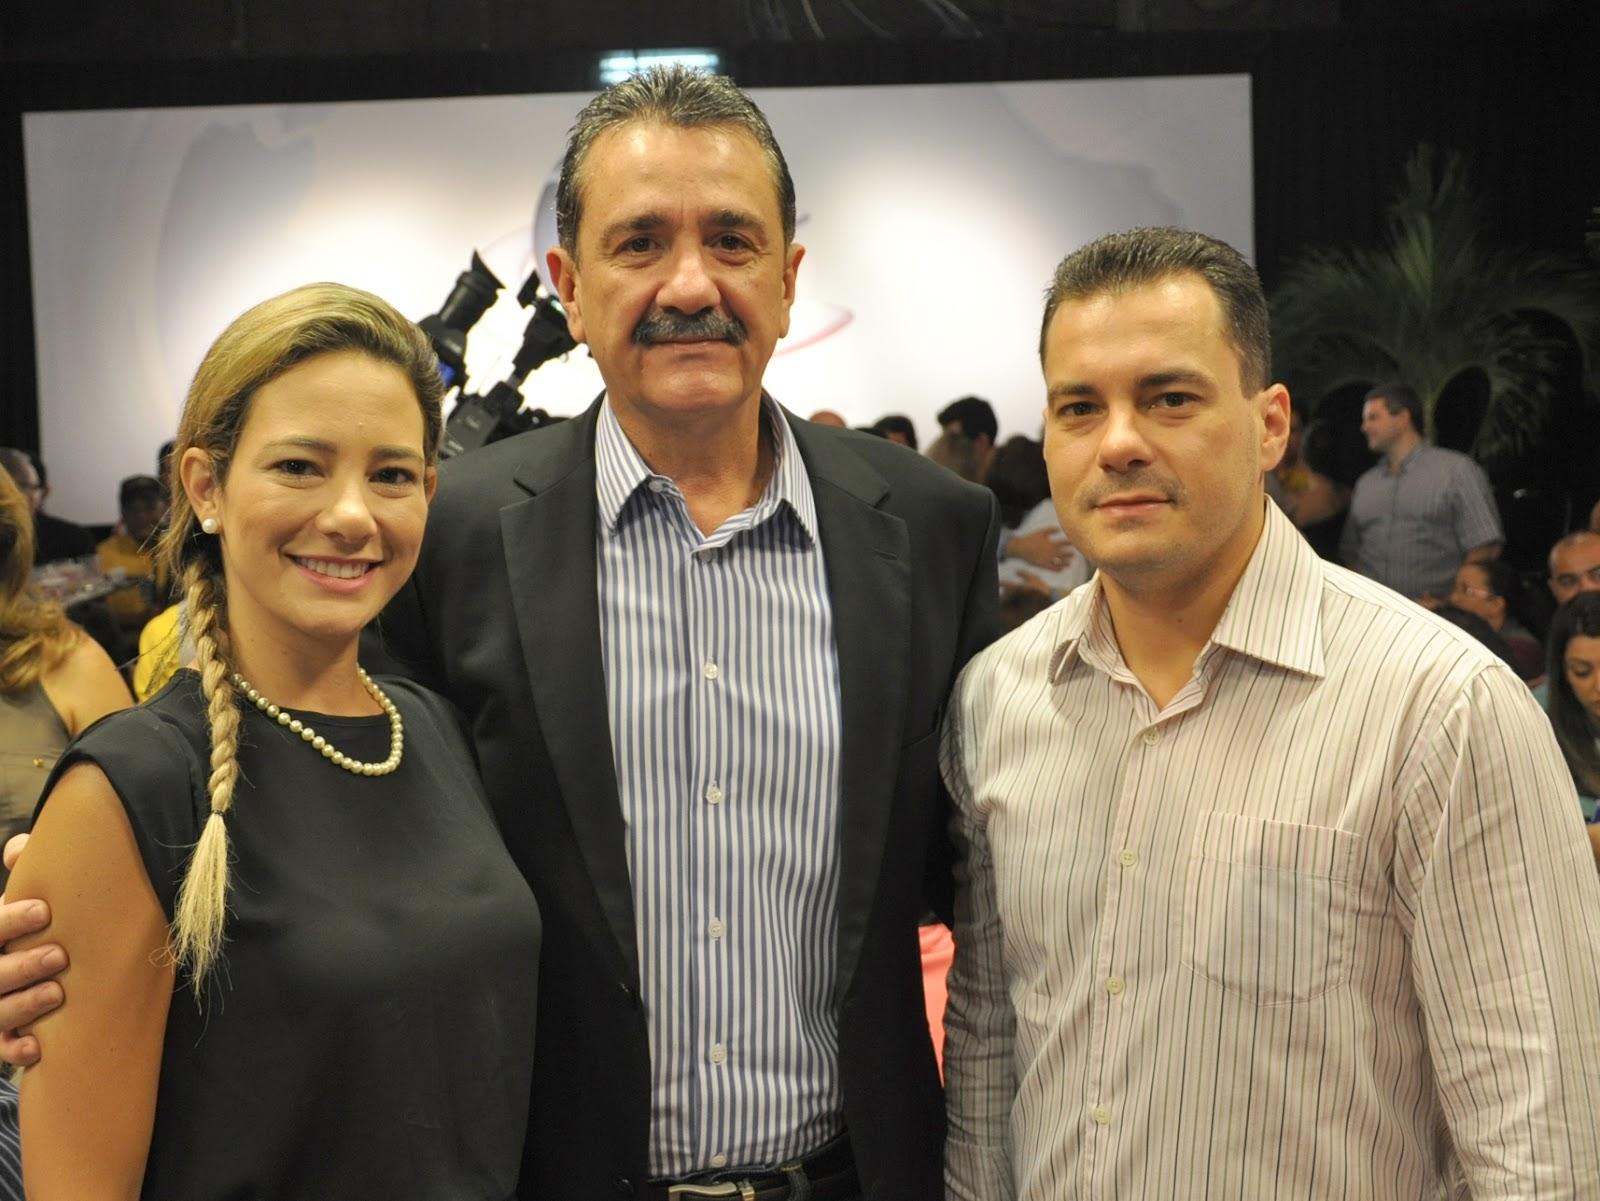 http://3.bp.blogspot.com/-Cbdyt0zkvpA/UAQGhI4M24I/AAAAAAAAOps/hEVbOf8MZtU/s1600/01+-+Ga%C3%ADda+Valim,+Bismarck+Maia+e+Miguel+Dias+Filho.jpg